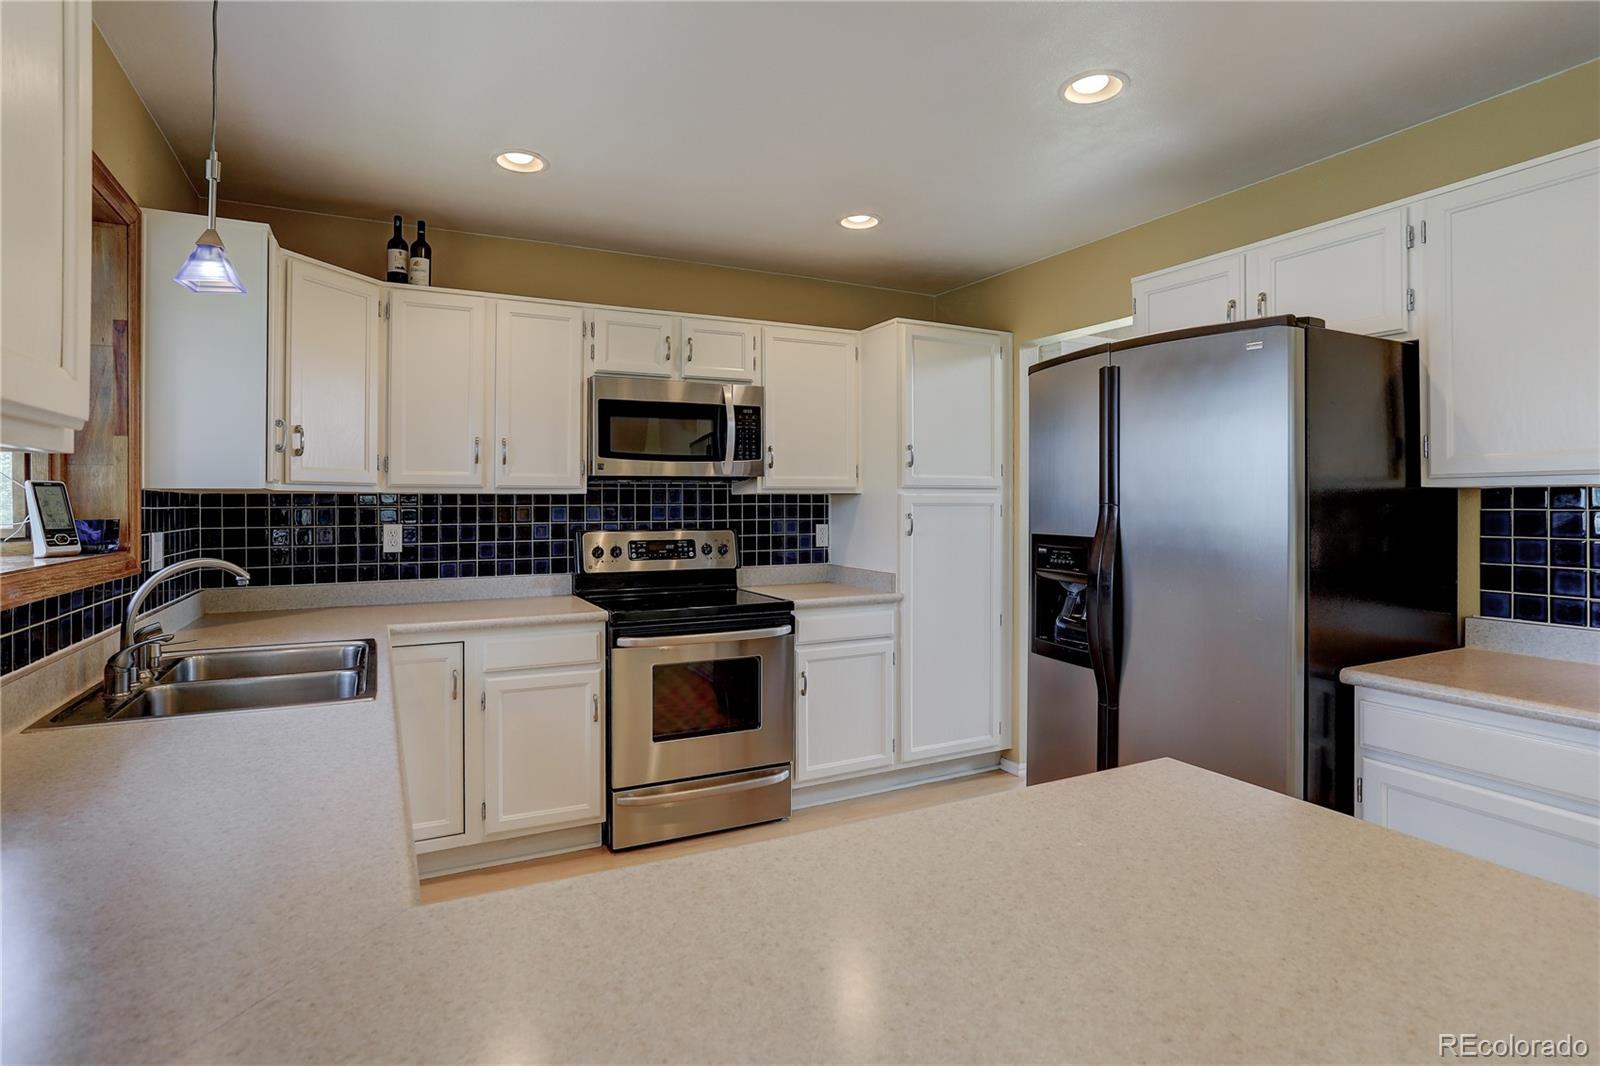 MLS# 9389187 - 9 - 1245 Goldsmith Drive, Highlands Ranch, CO 80126